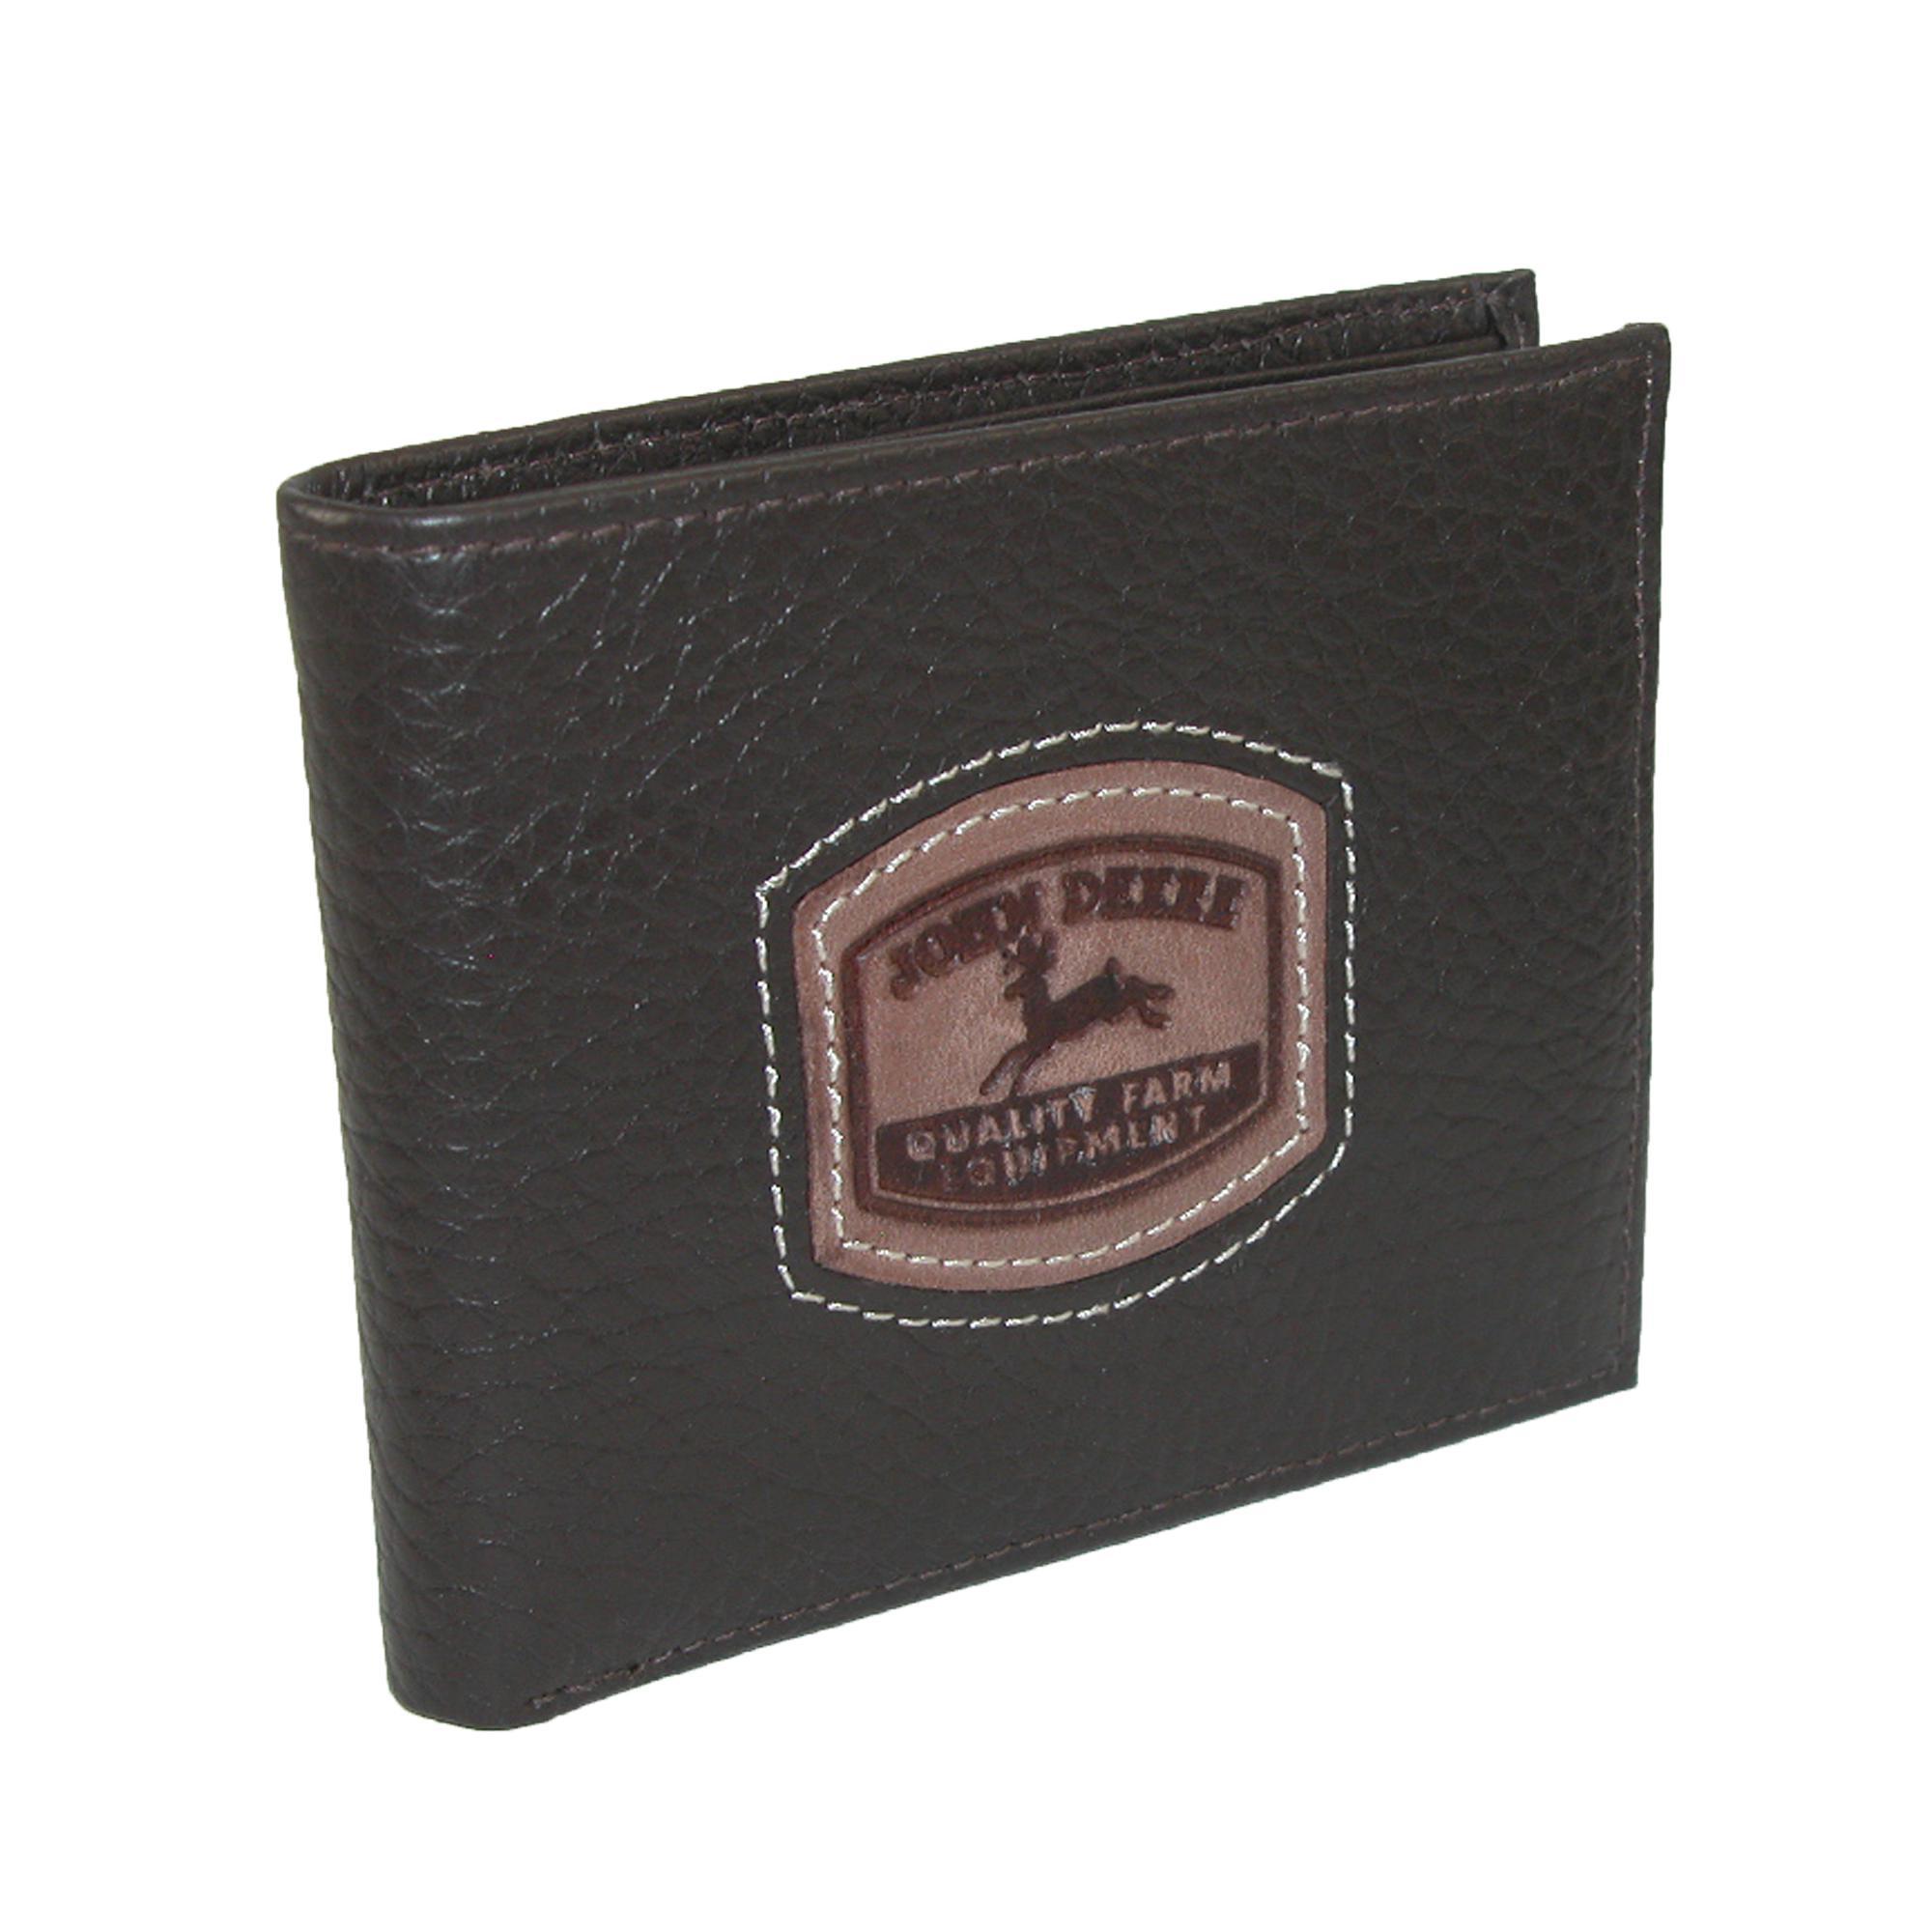 John Deere Men's Leather Passcase Billfold Wallet With Embossed Patch